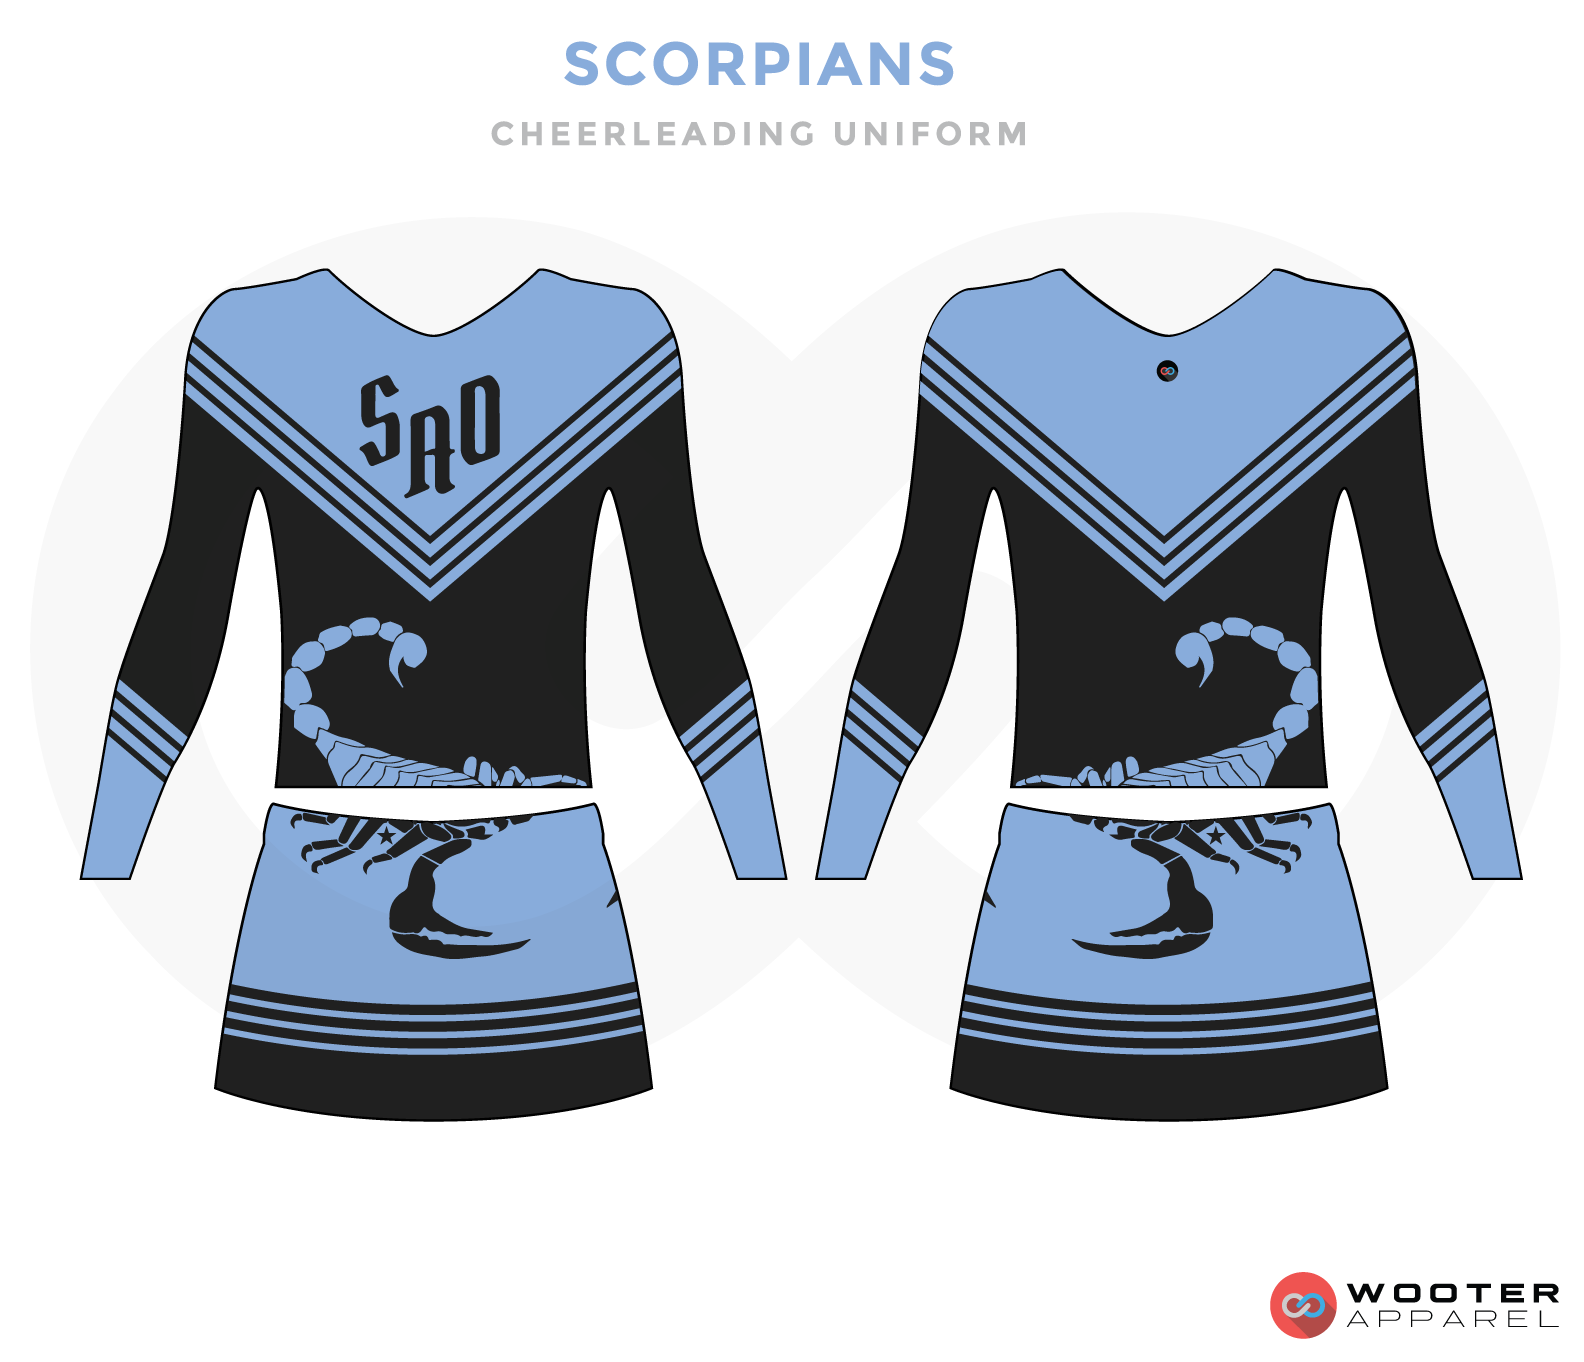 SCORPIANS black blue cheerleading uniforms, top, and skirt